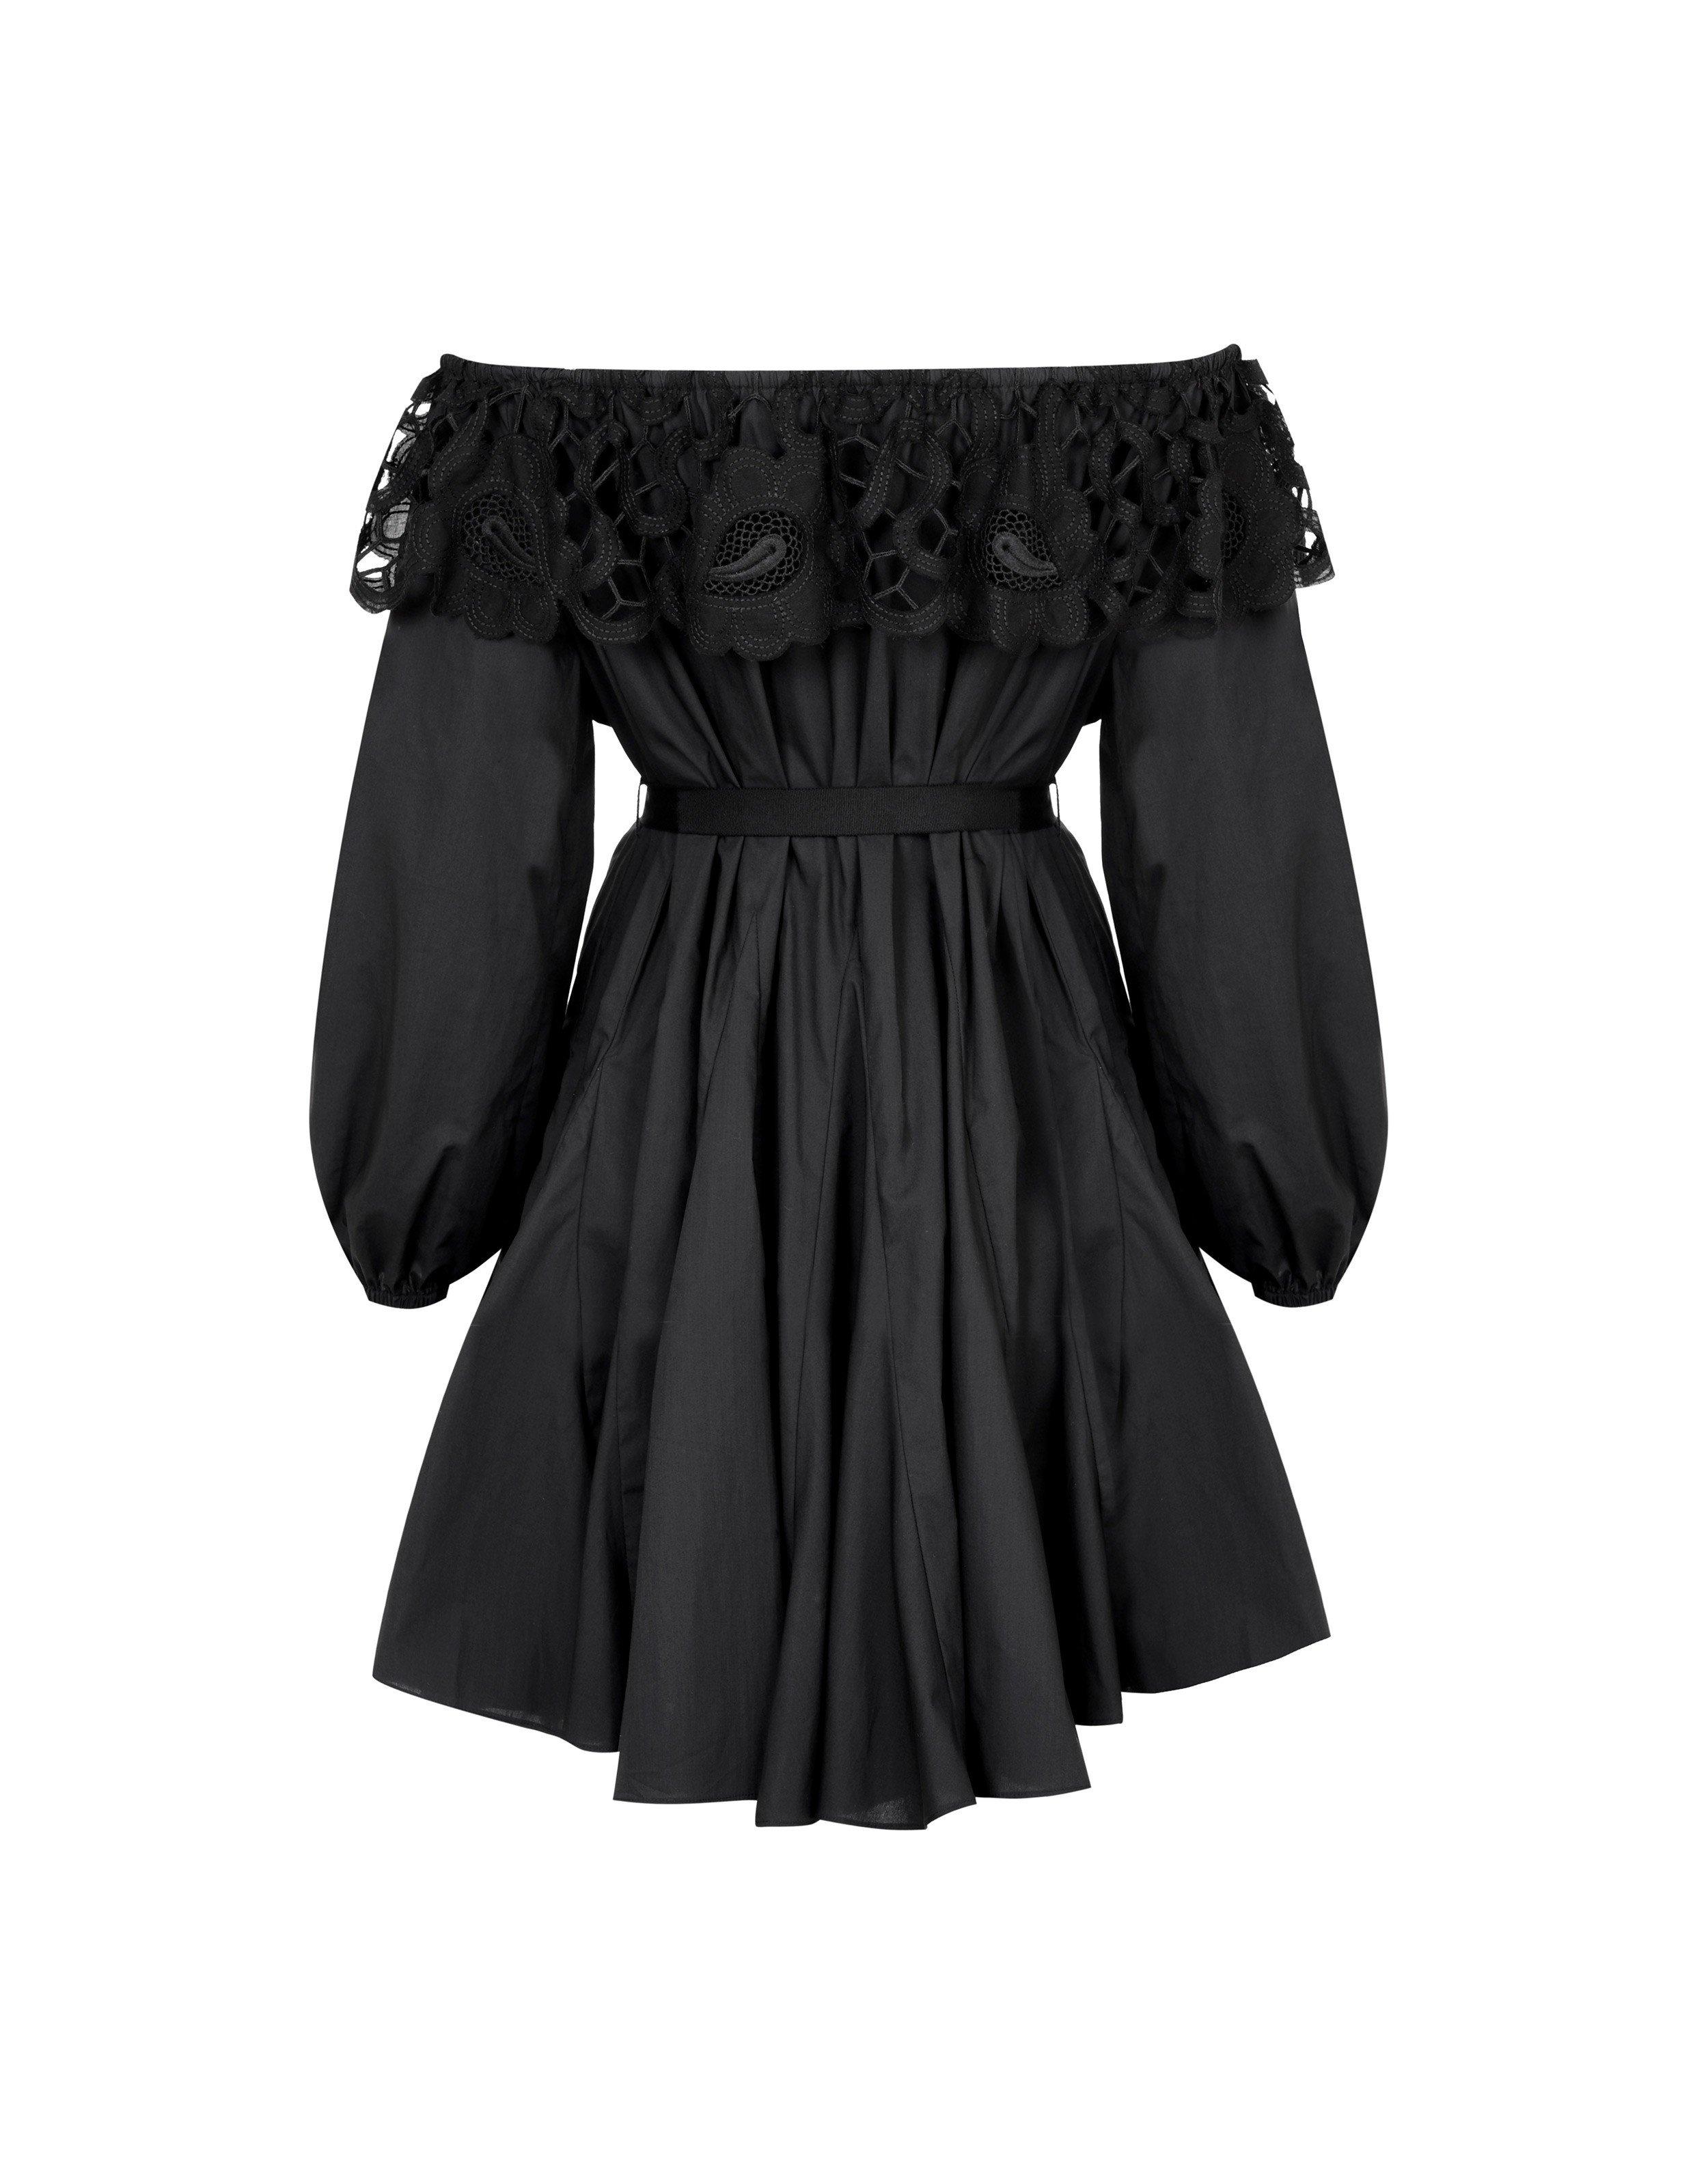 Agent Provocateur Daize Mini Dress In Black